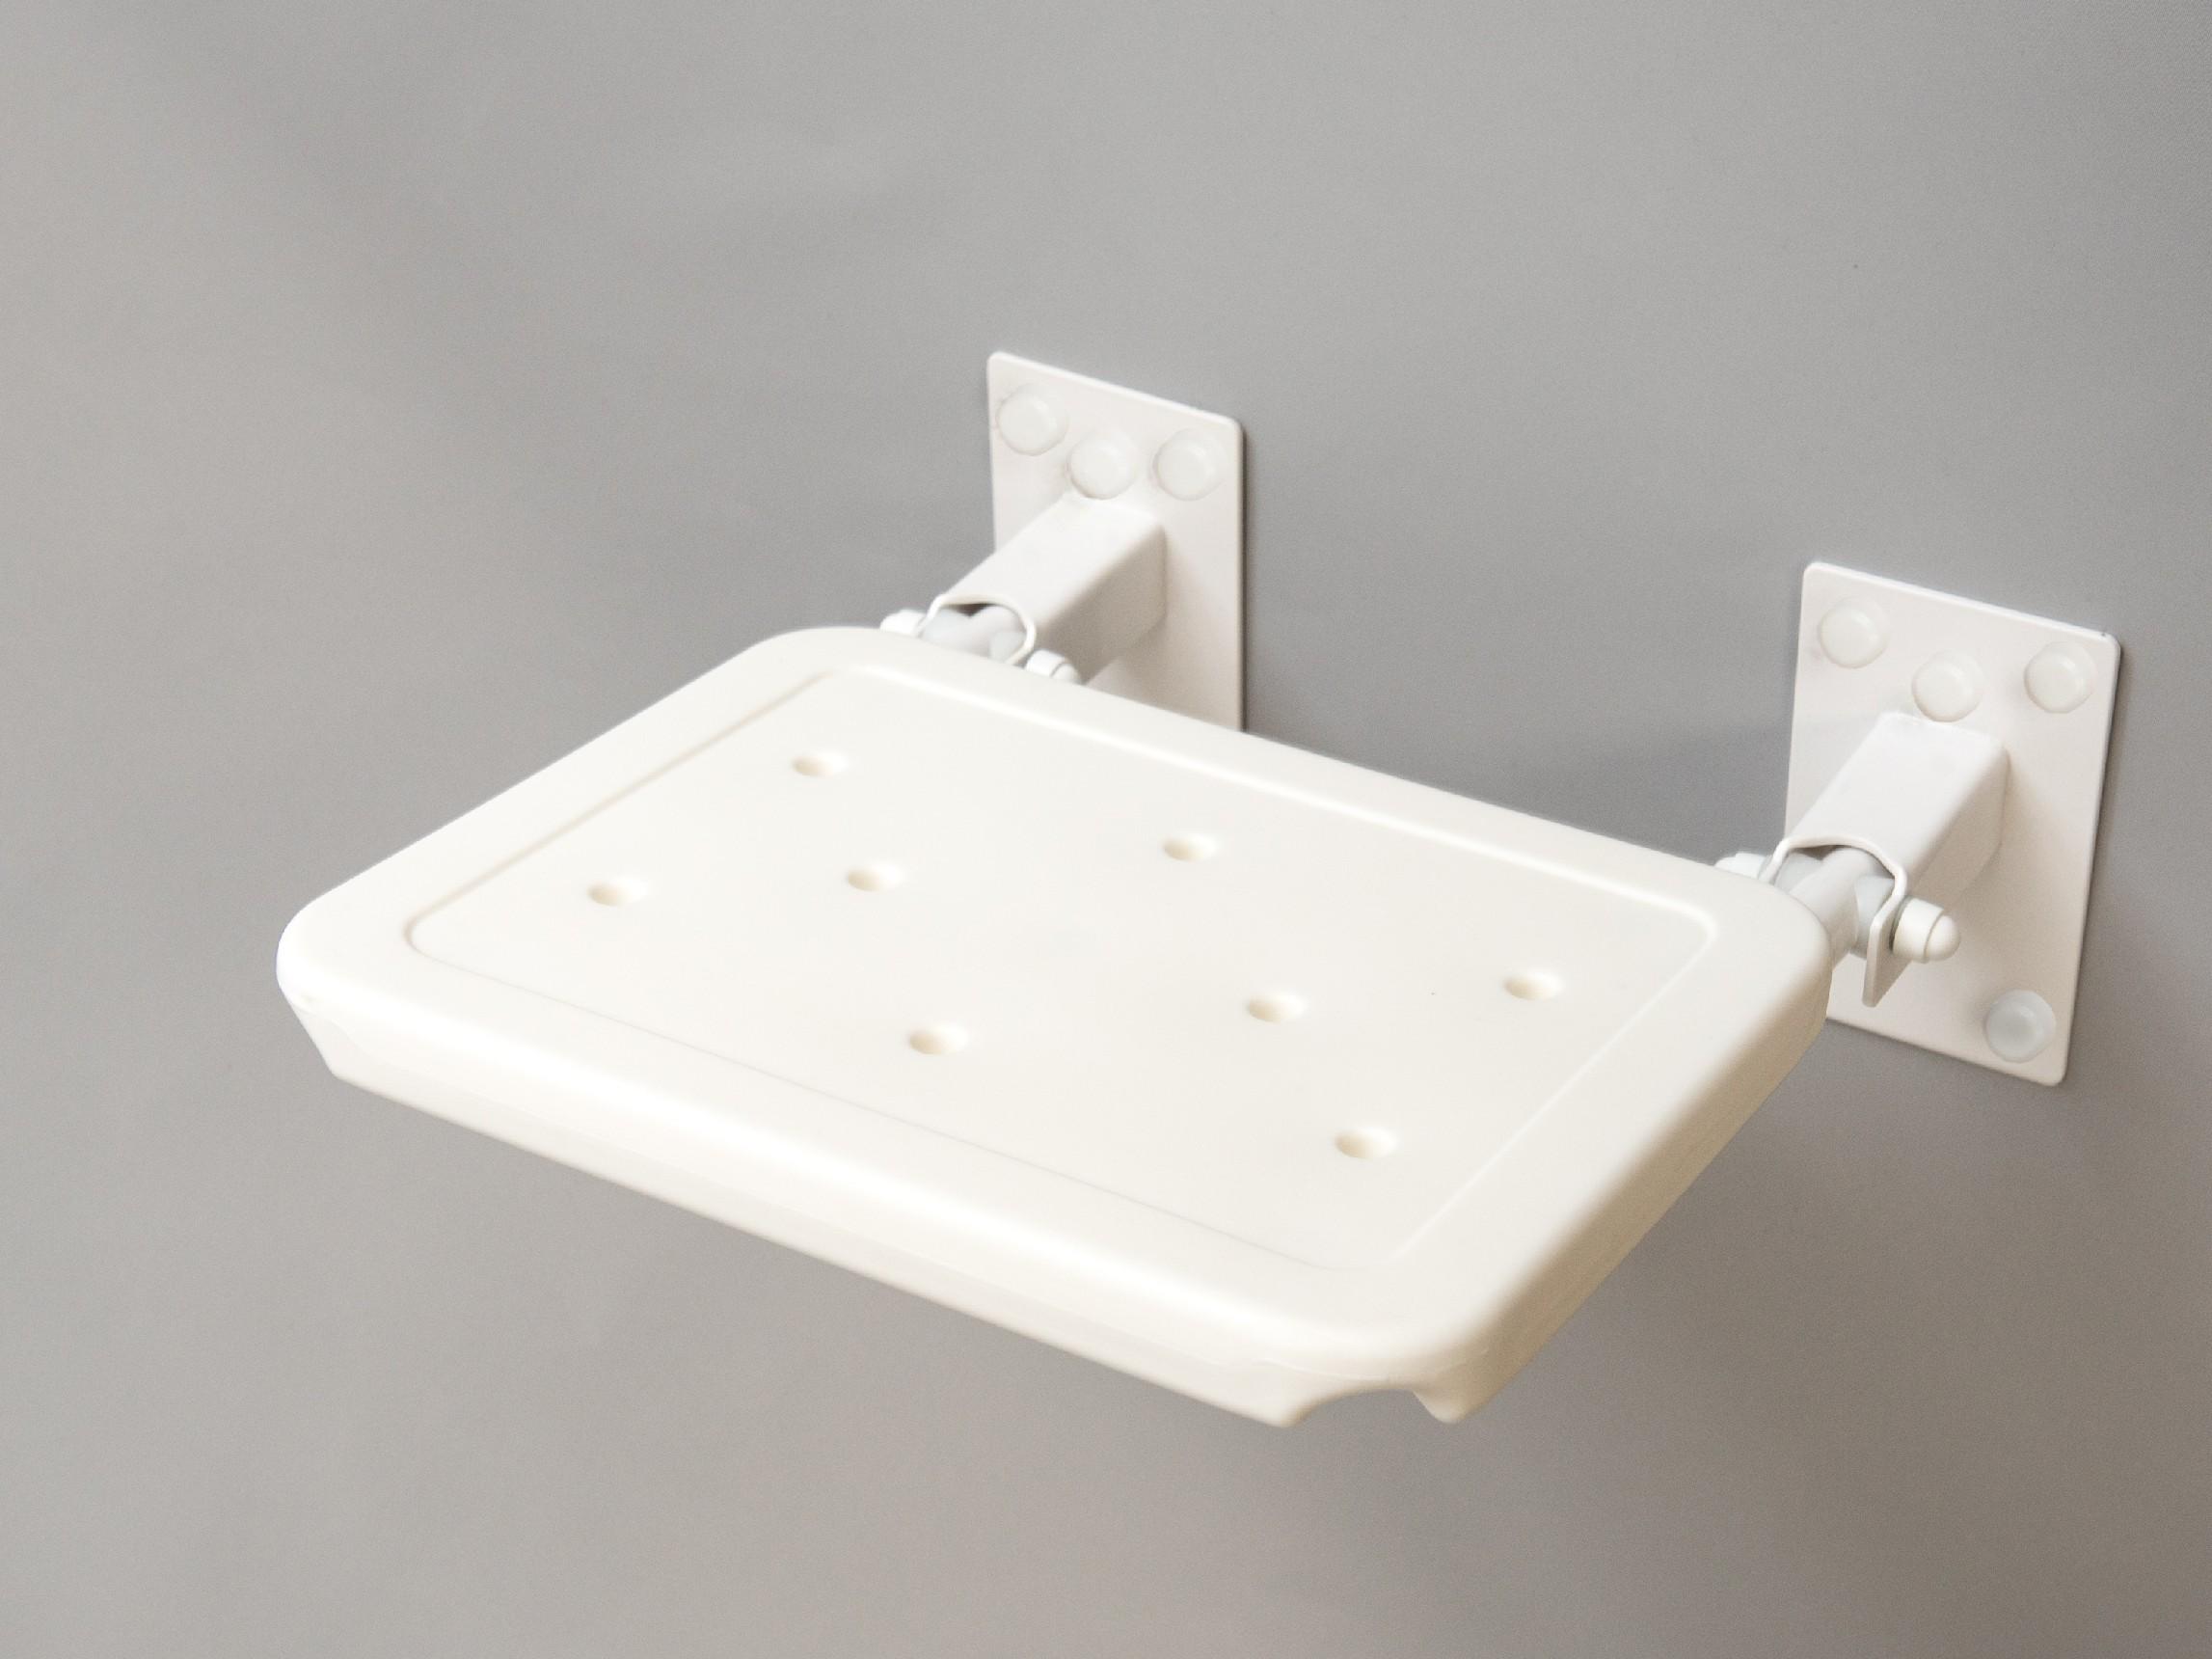 sprchové sedátko sklopné závěsné BÍLÉ COMPACT